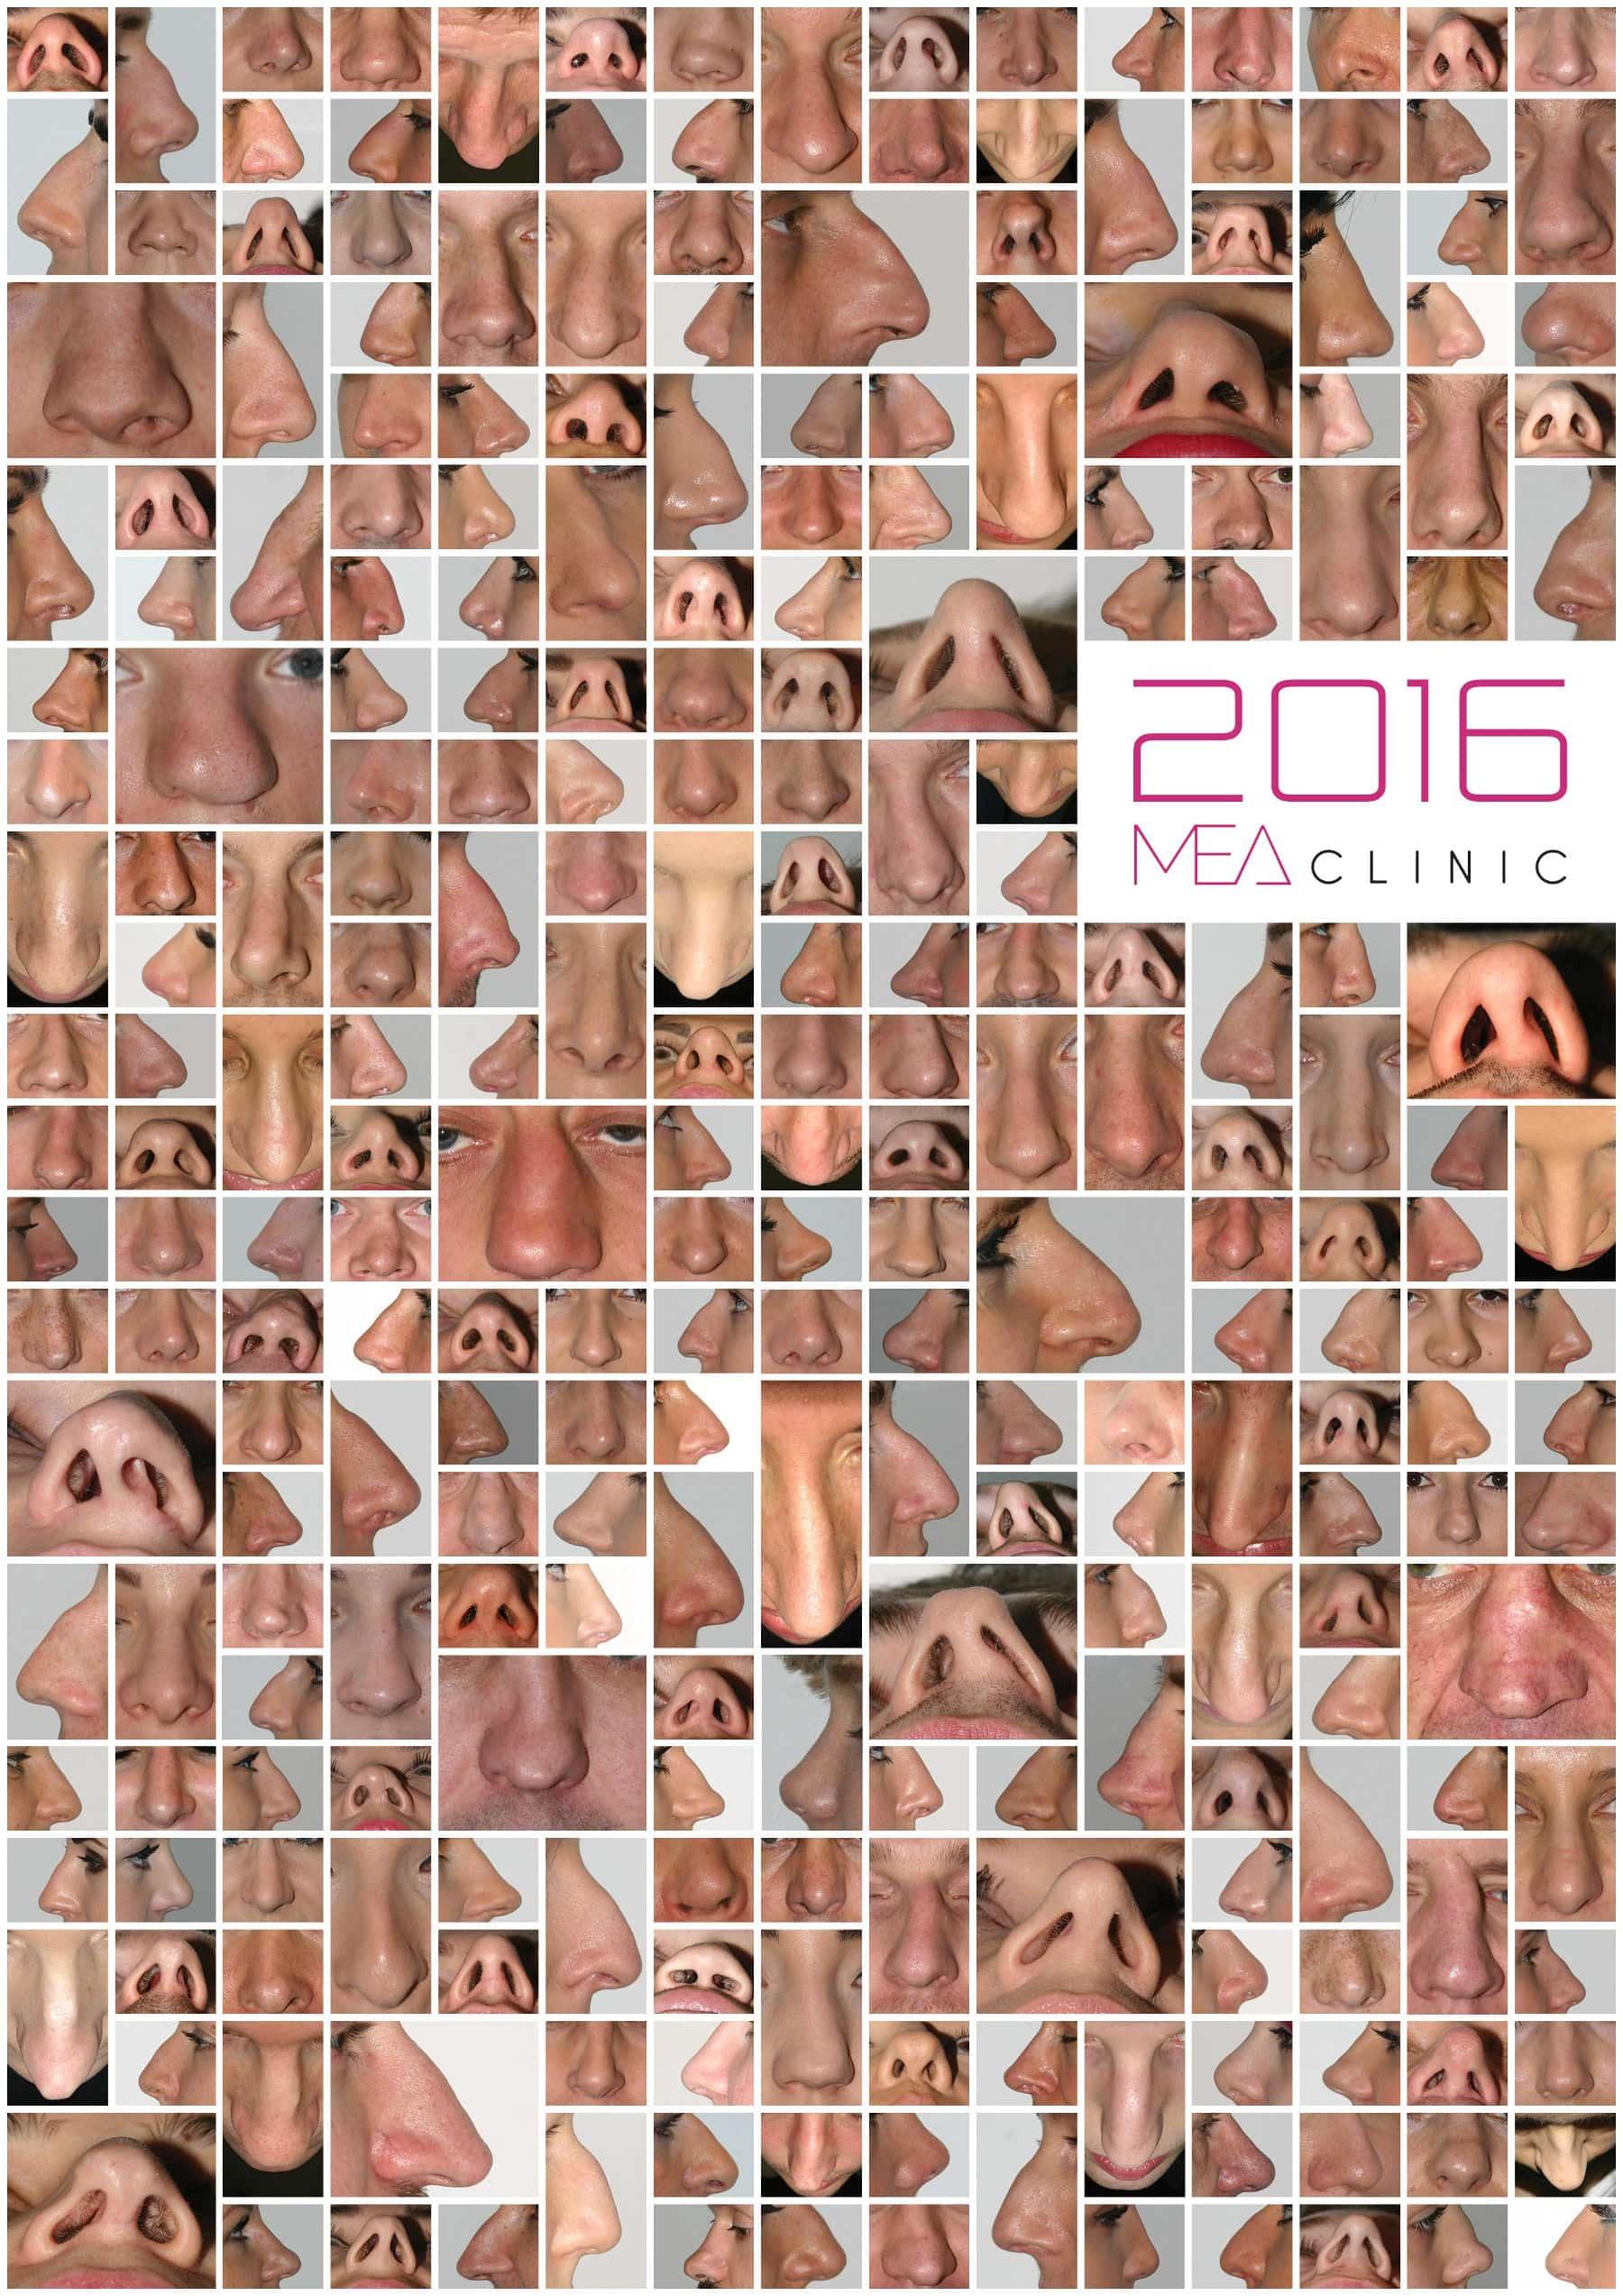 korekcja nosa - kolaż